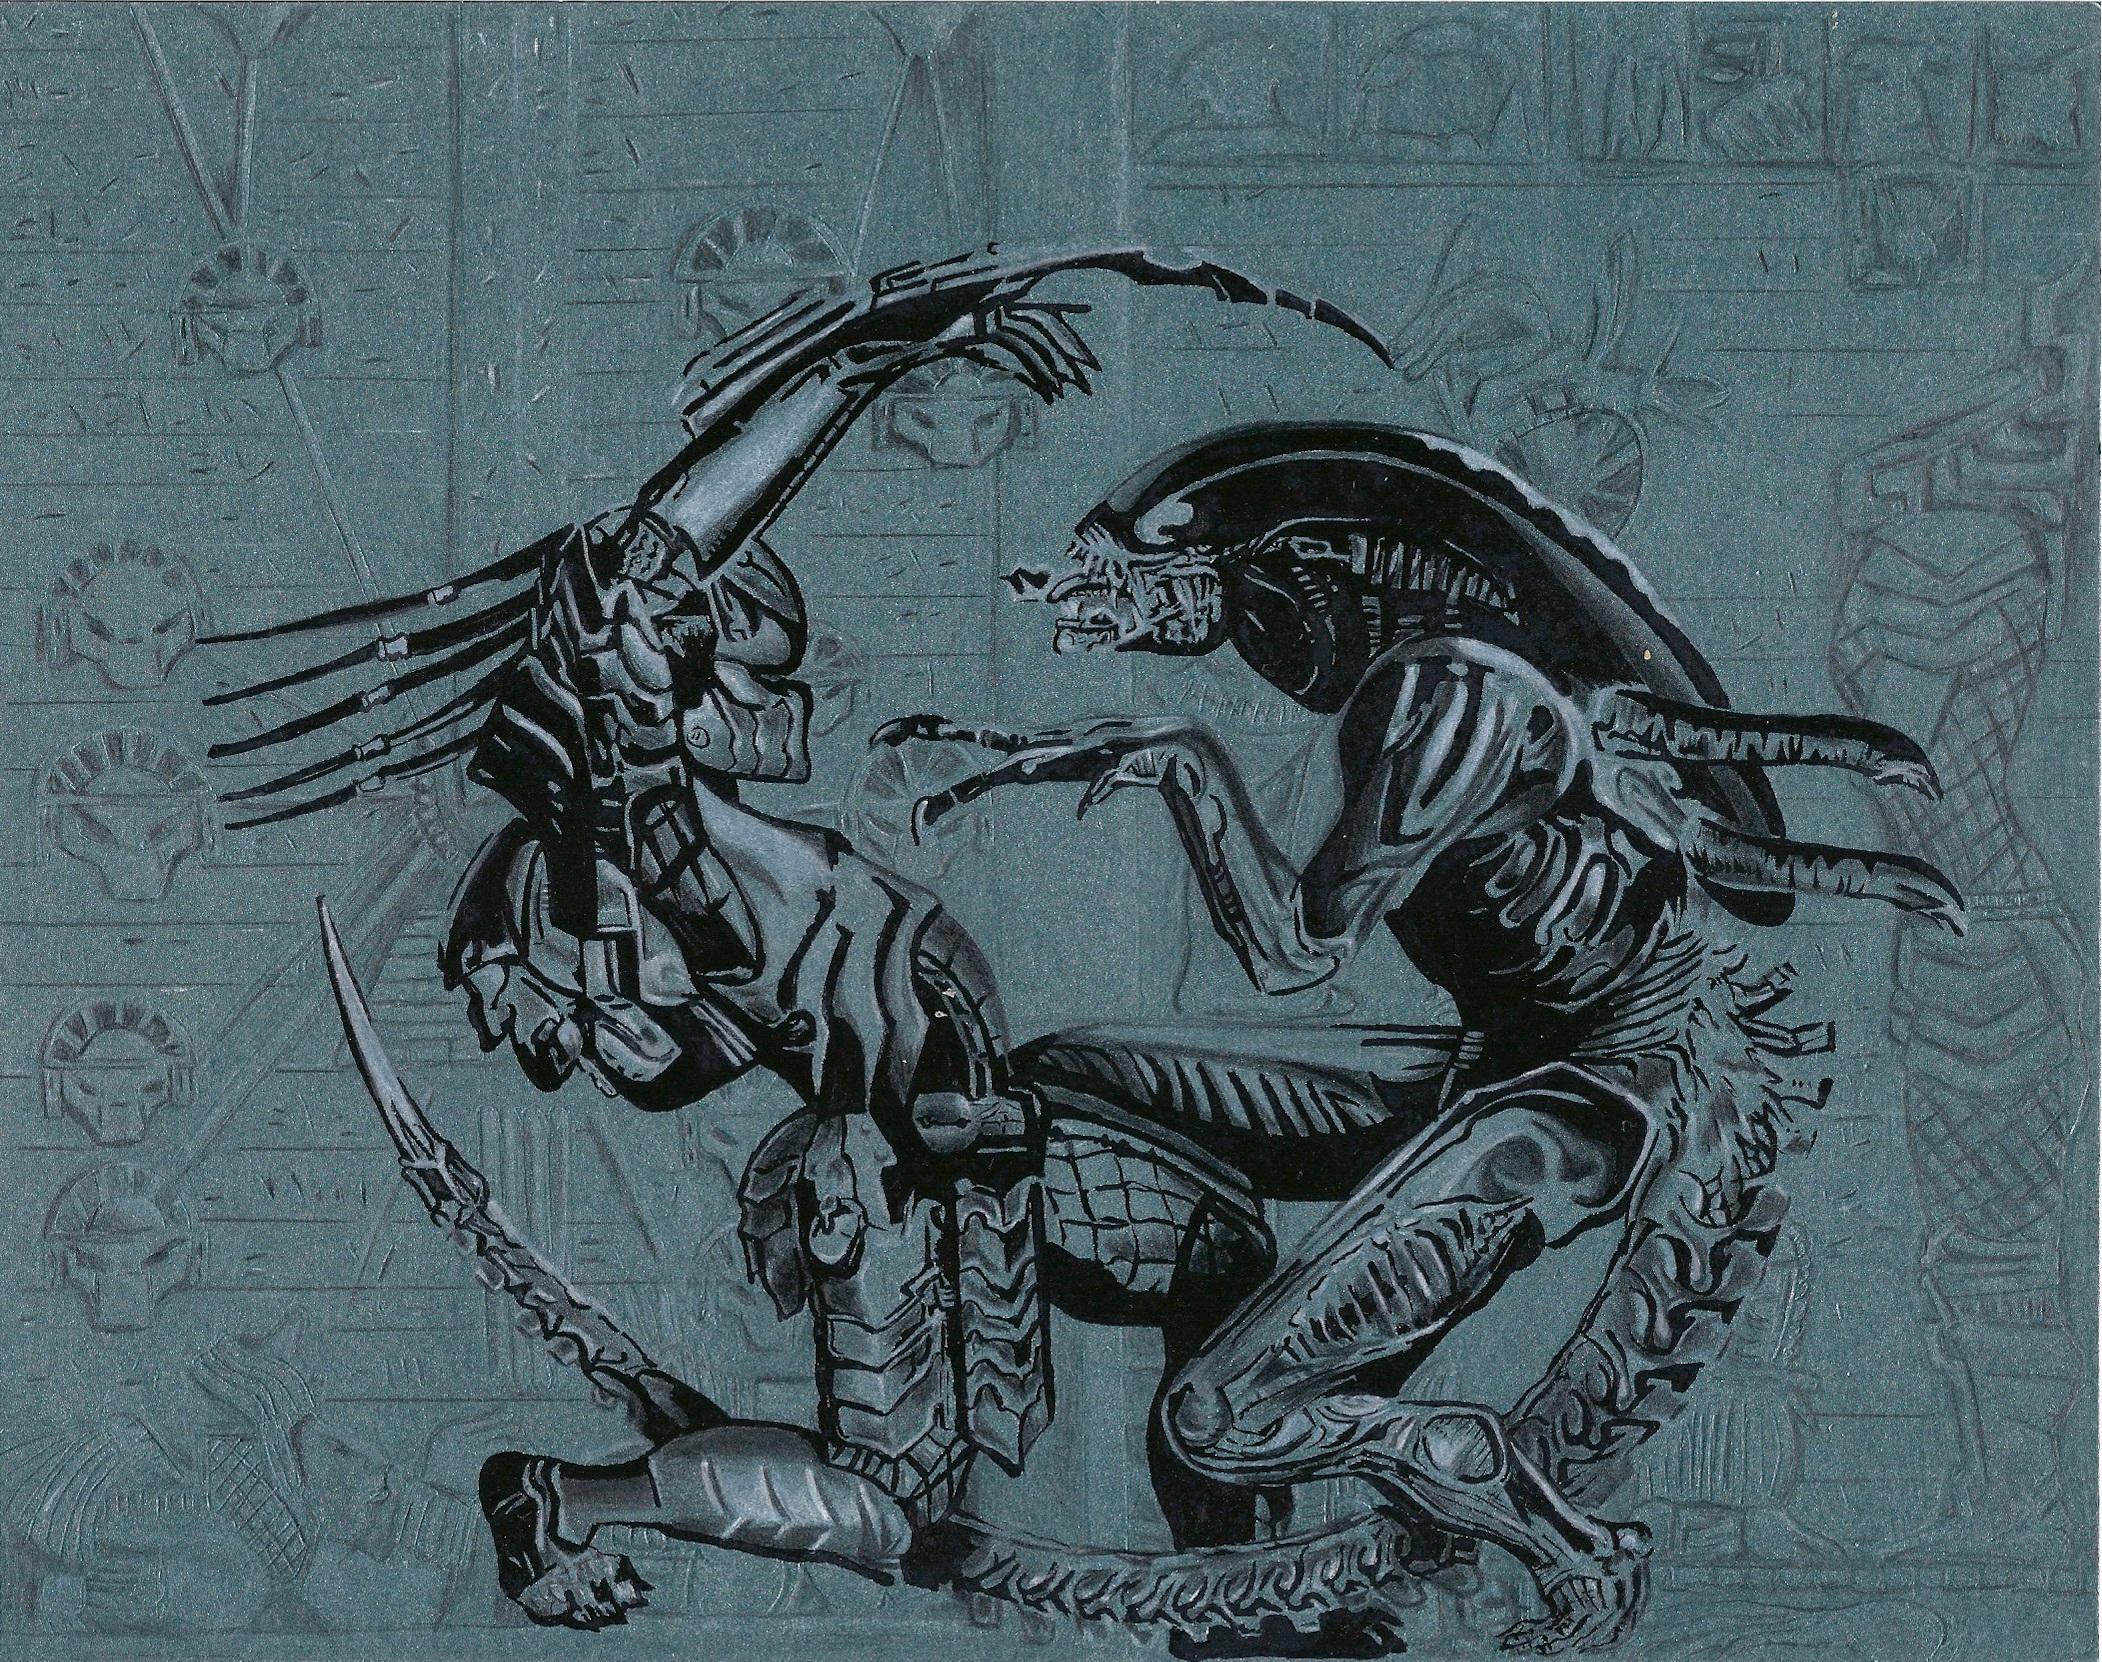 aliens vs predator drawings - photo #8